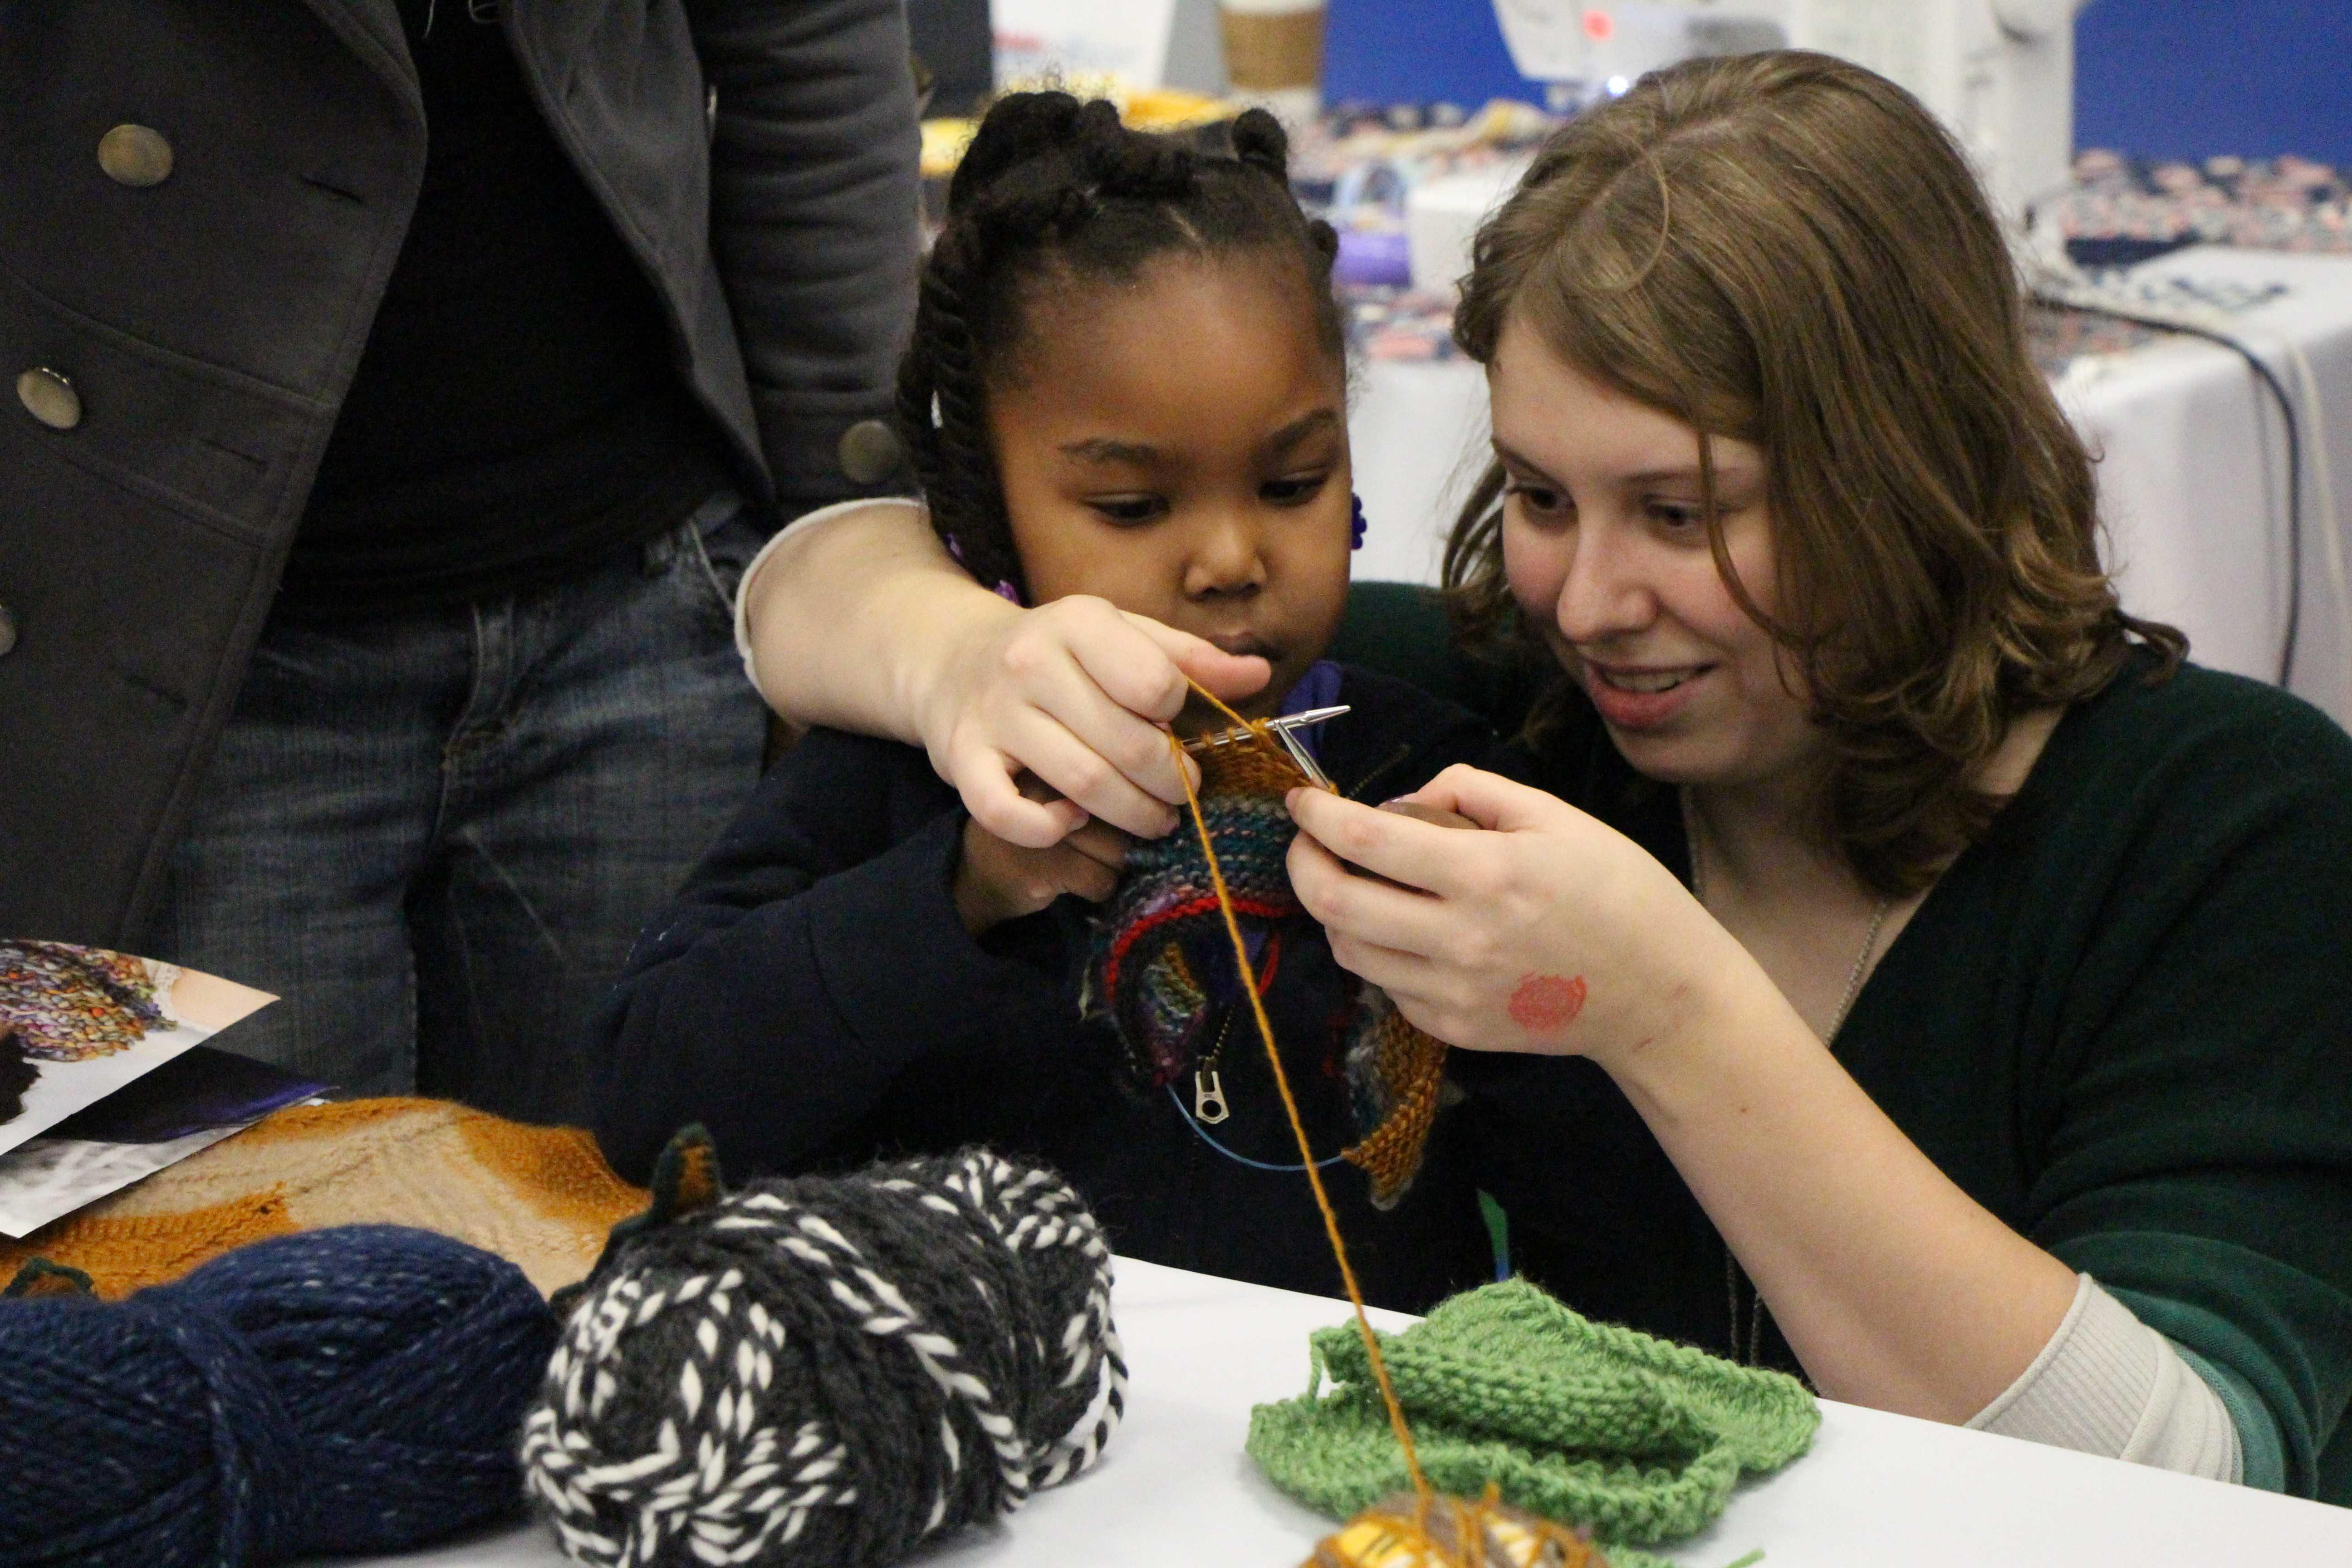 Maker Faire encourages ingenuity